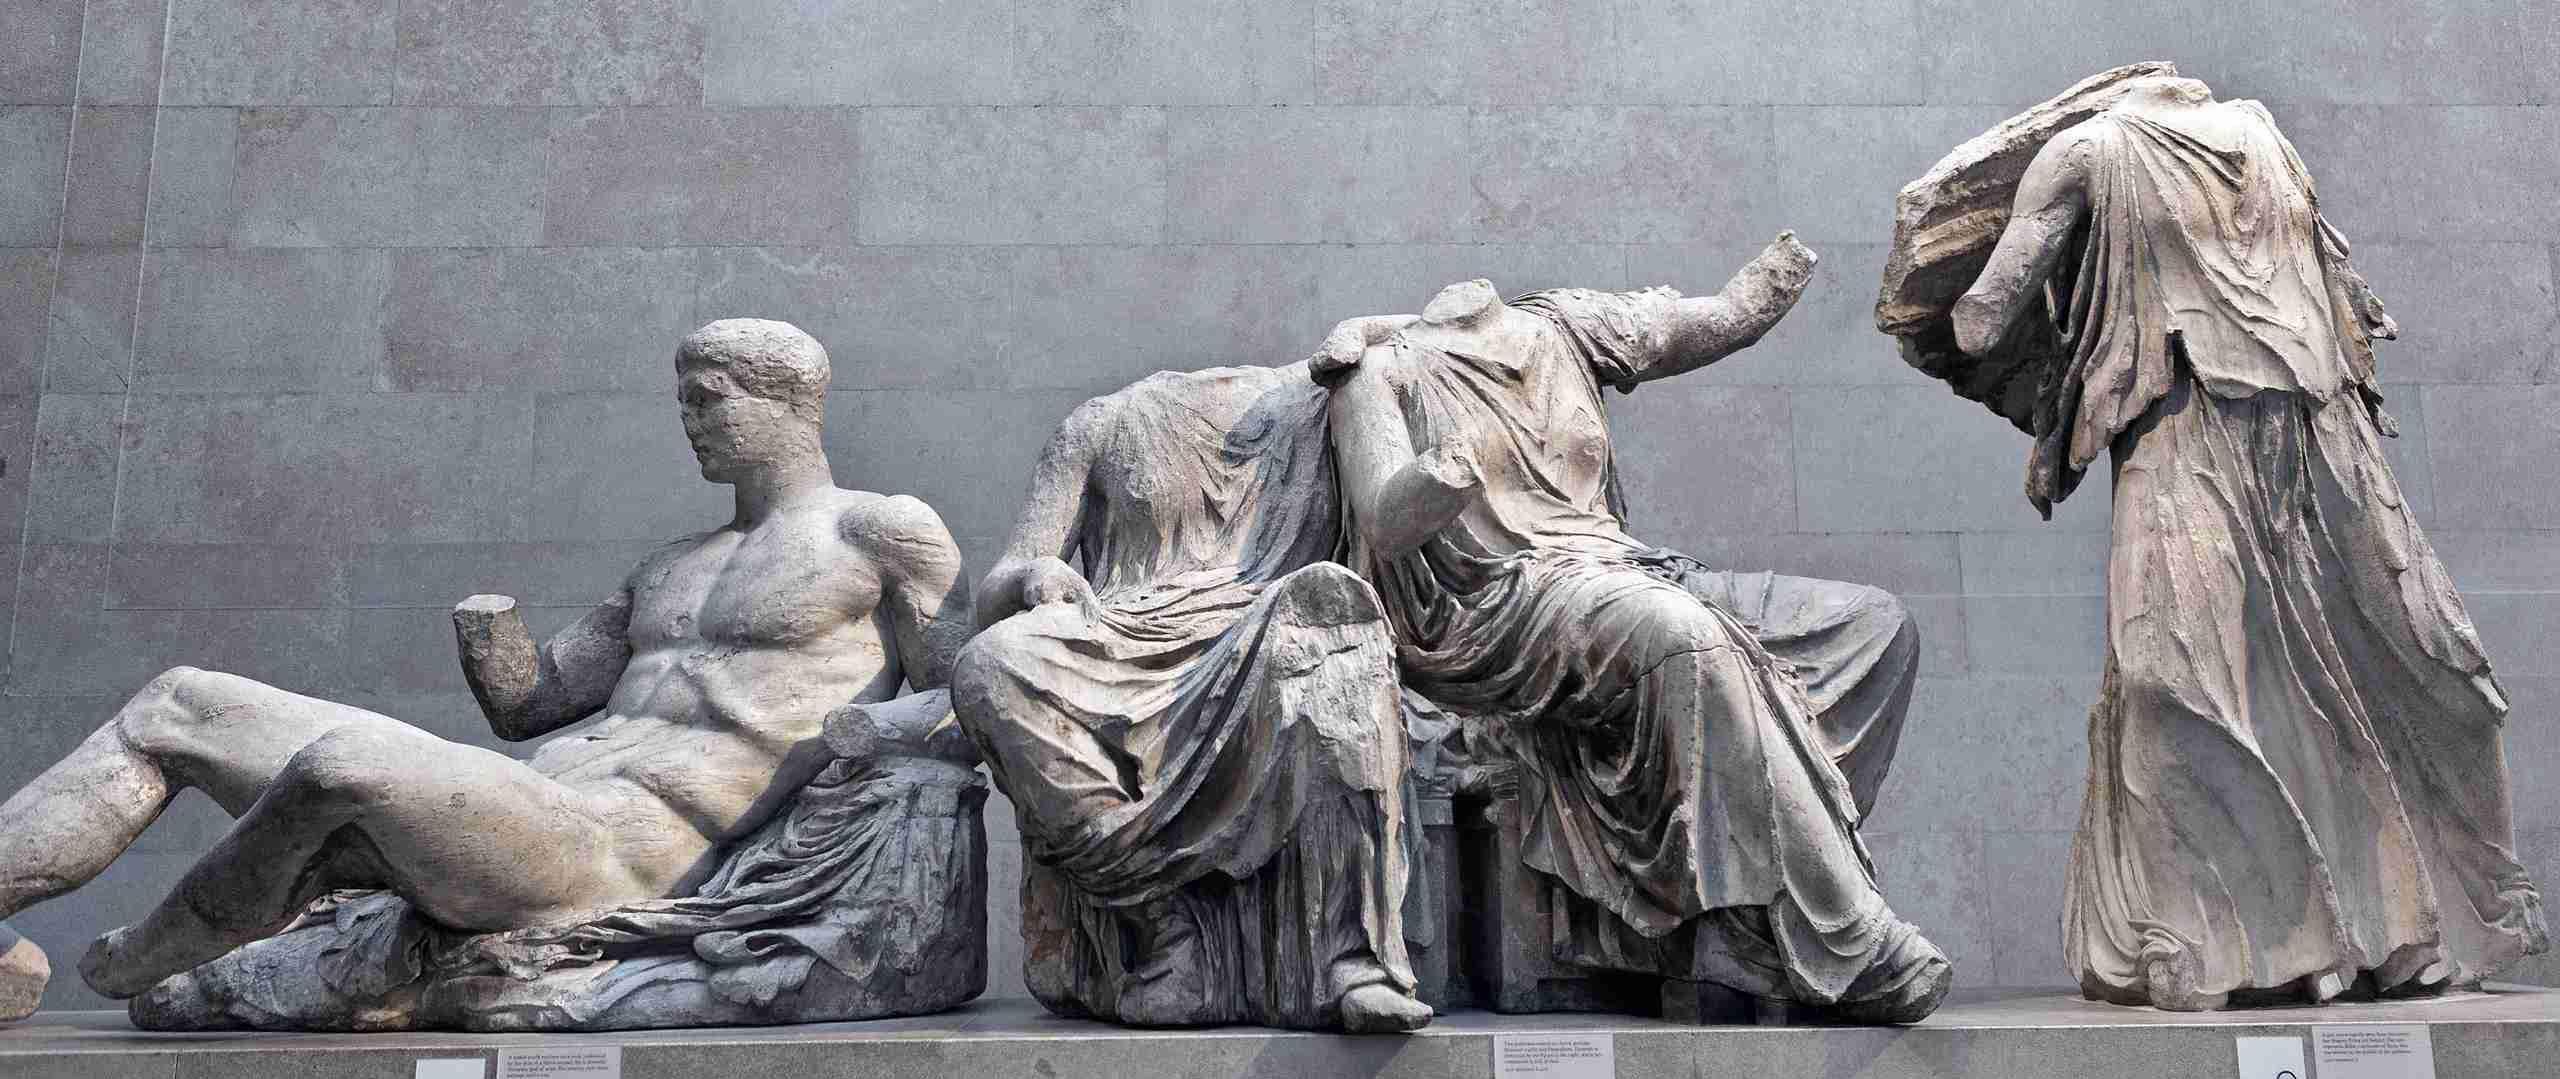 Group sculptures of Parthenon